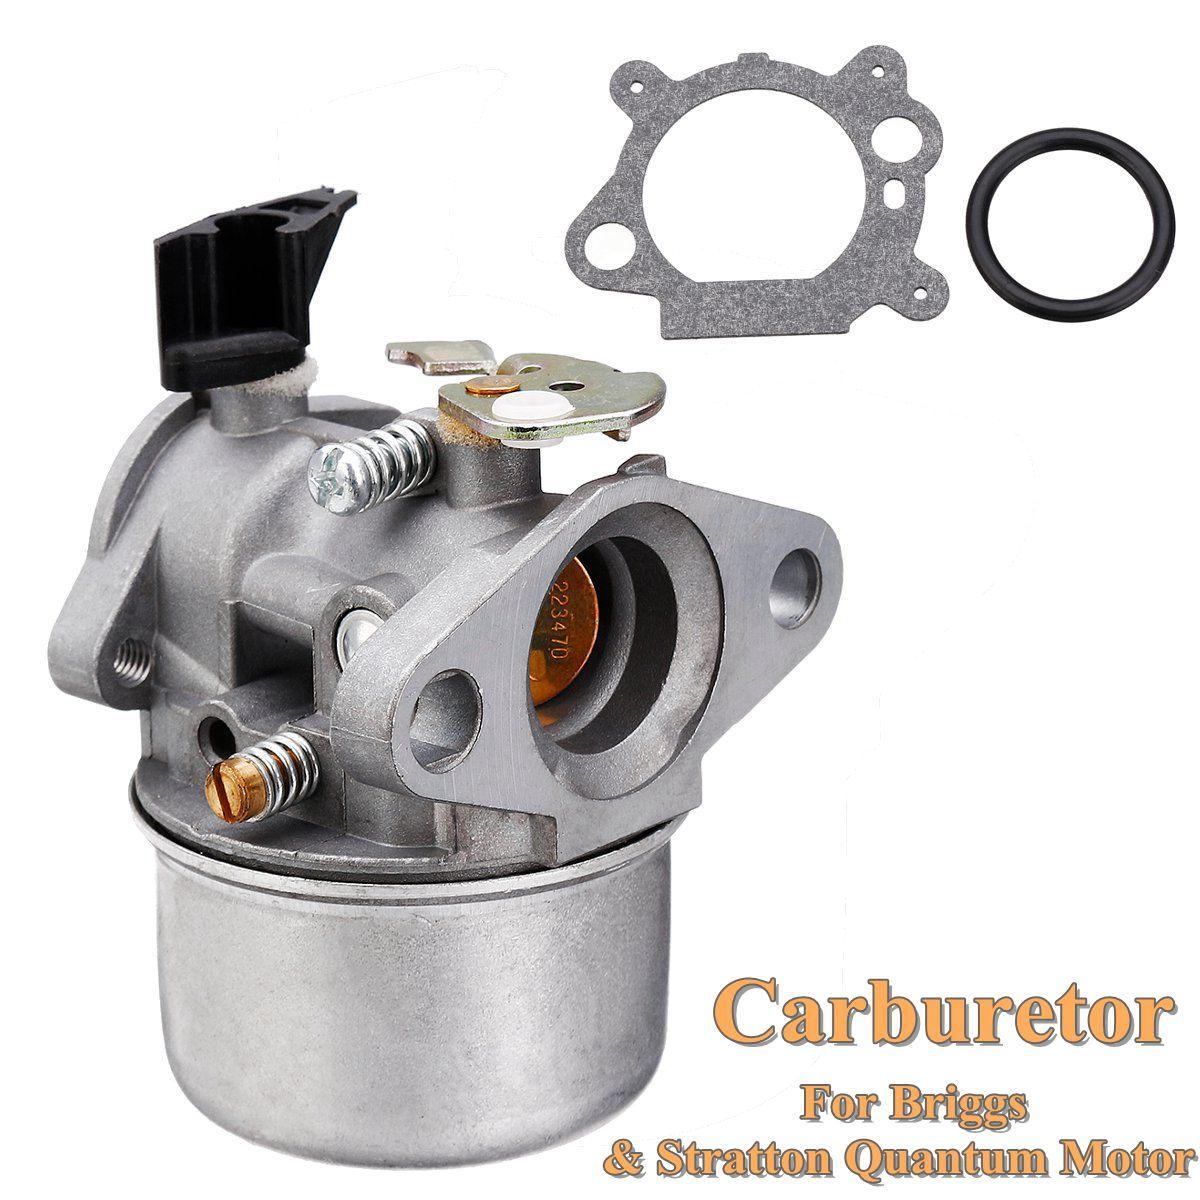 1 Pcs Choke Vergaser carburateur carburetor Briggs Stratton Quantum Motor 498965 with Gasket and Rubber Ring1 Pcs Choke Vergaser carburateur carburetor Briggs Stratton Quantum Motor 498965 with Gasket and Rubber Ring